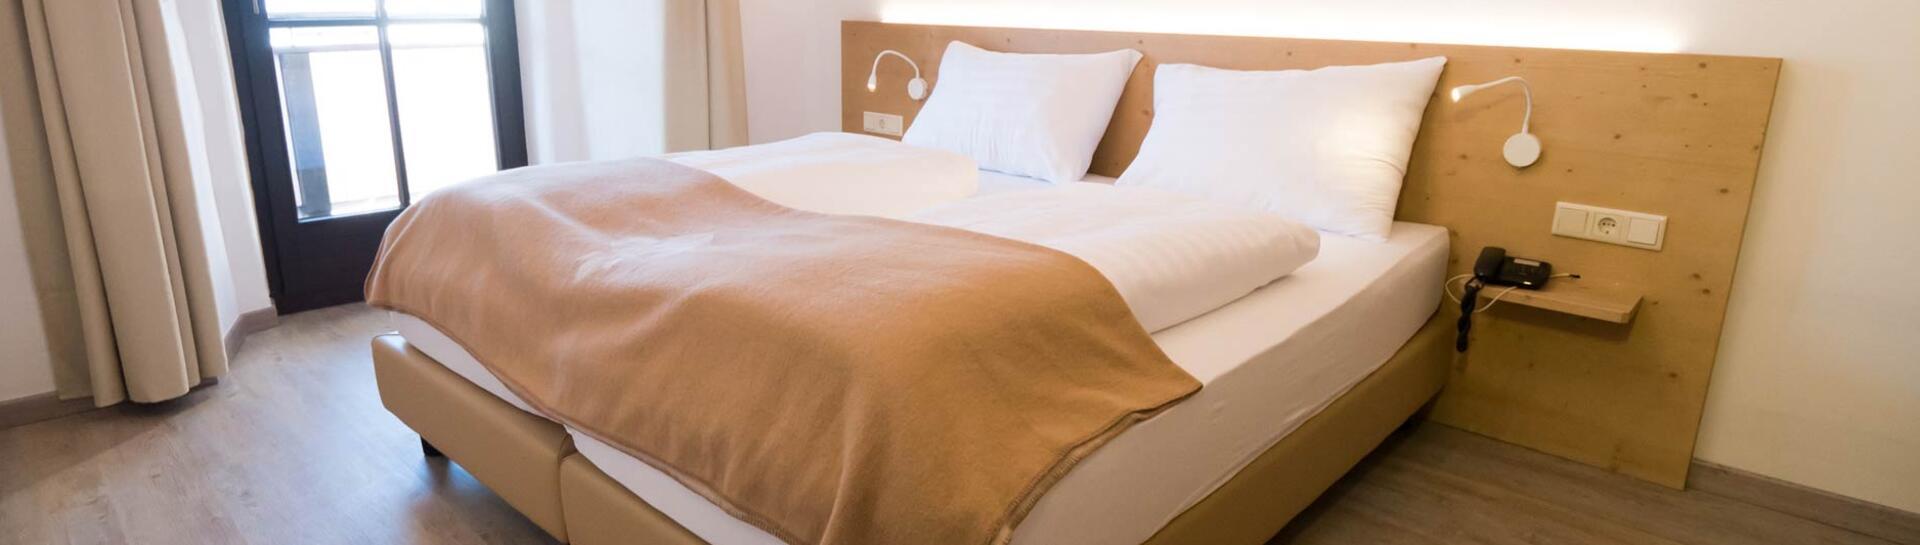 schlosshotel-rosenegg de zimmer-suiten 003